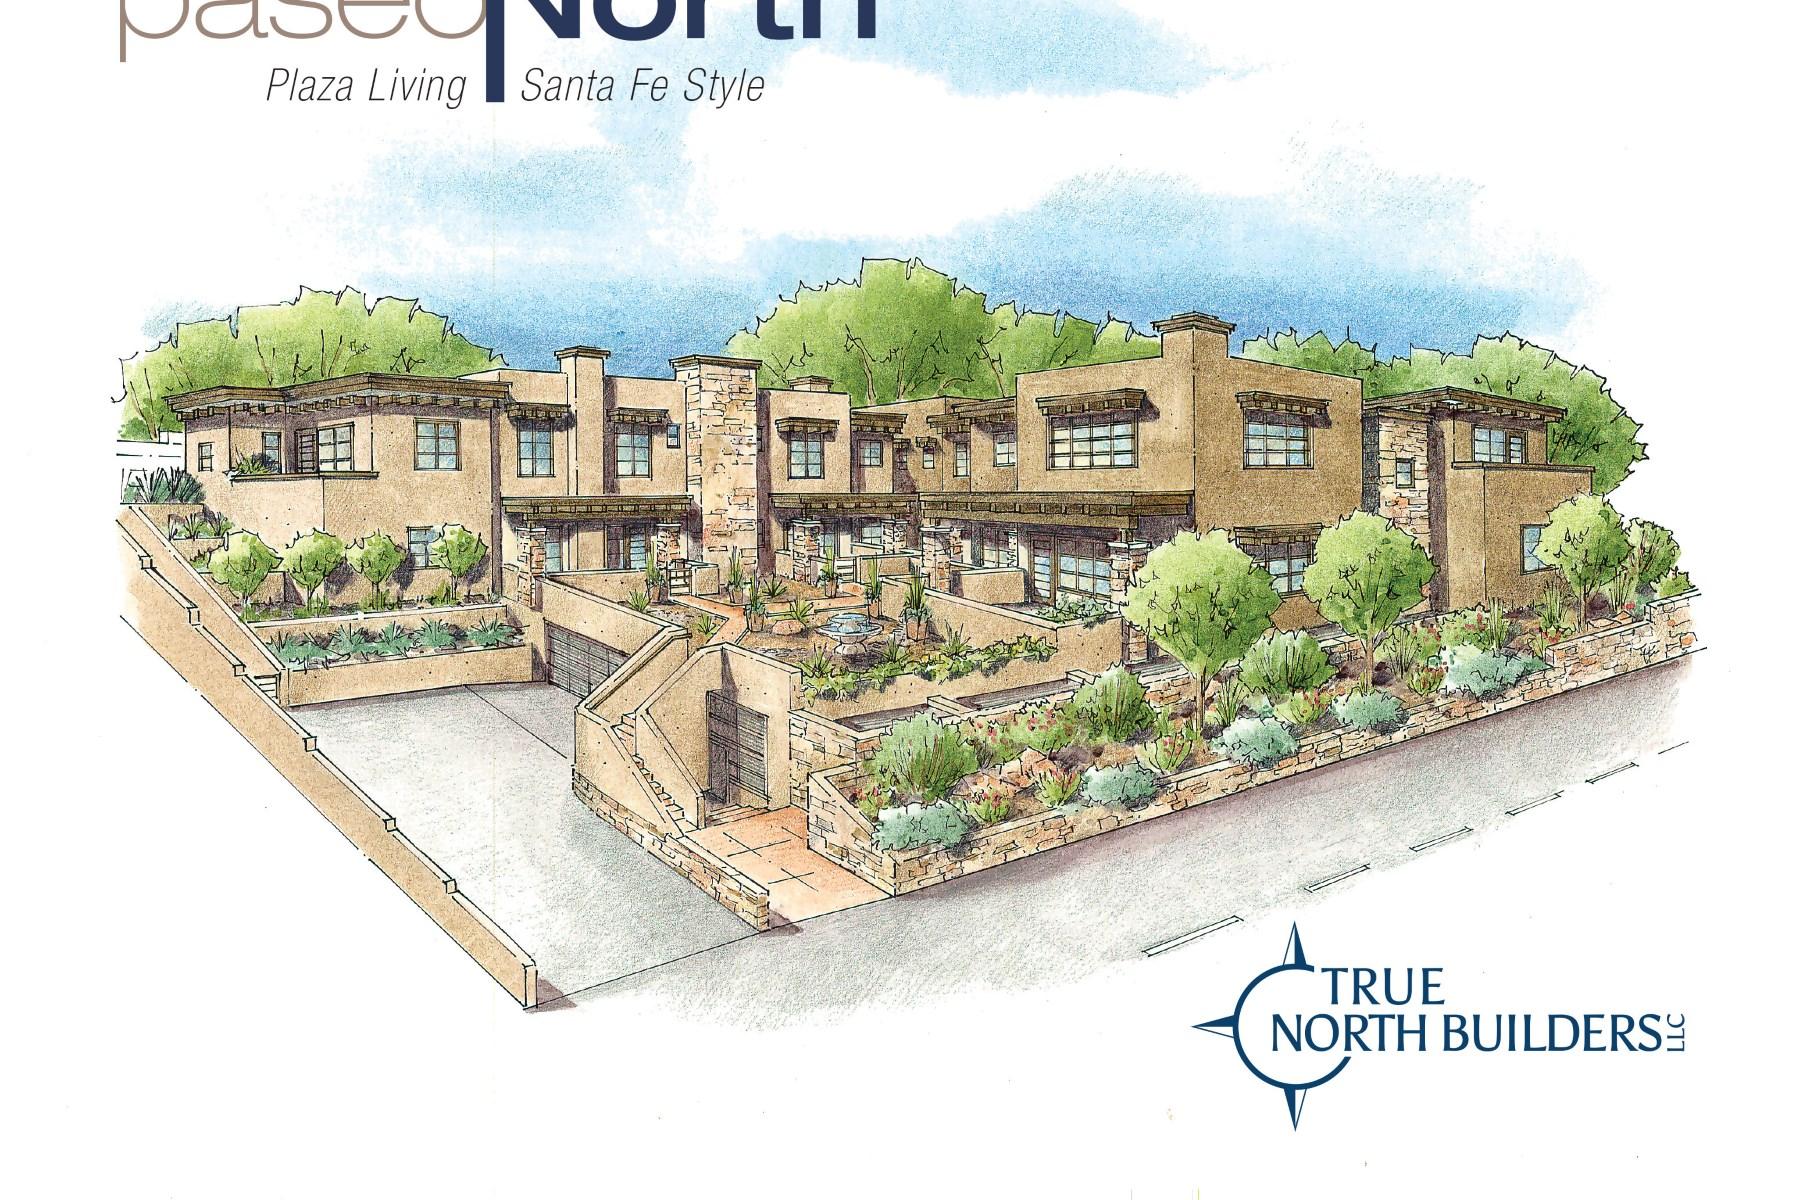 Condominium for Sale at 511 Paseo De Peralta #4 Santa Fe City Northeast, Santa Fe, New Mexico, 87501 United States